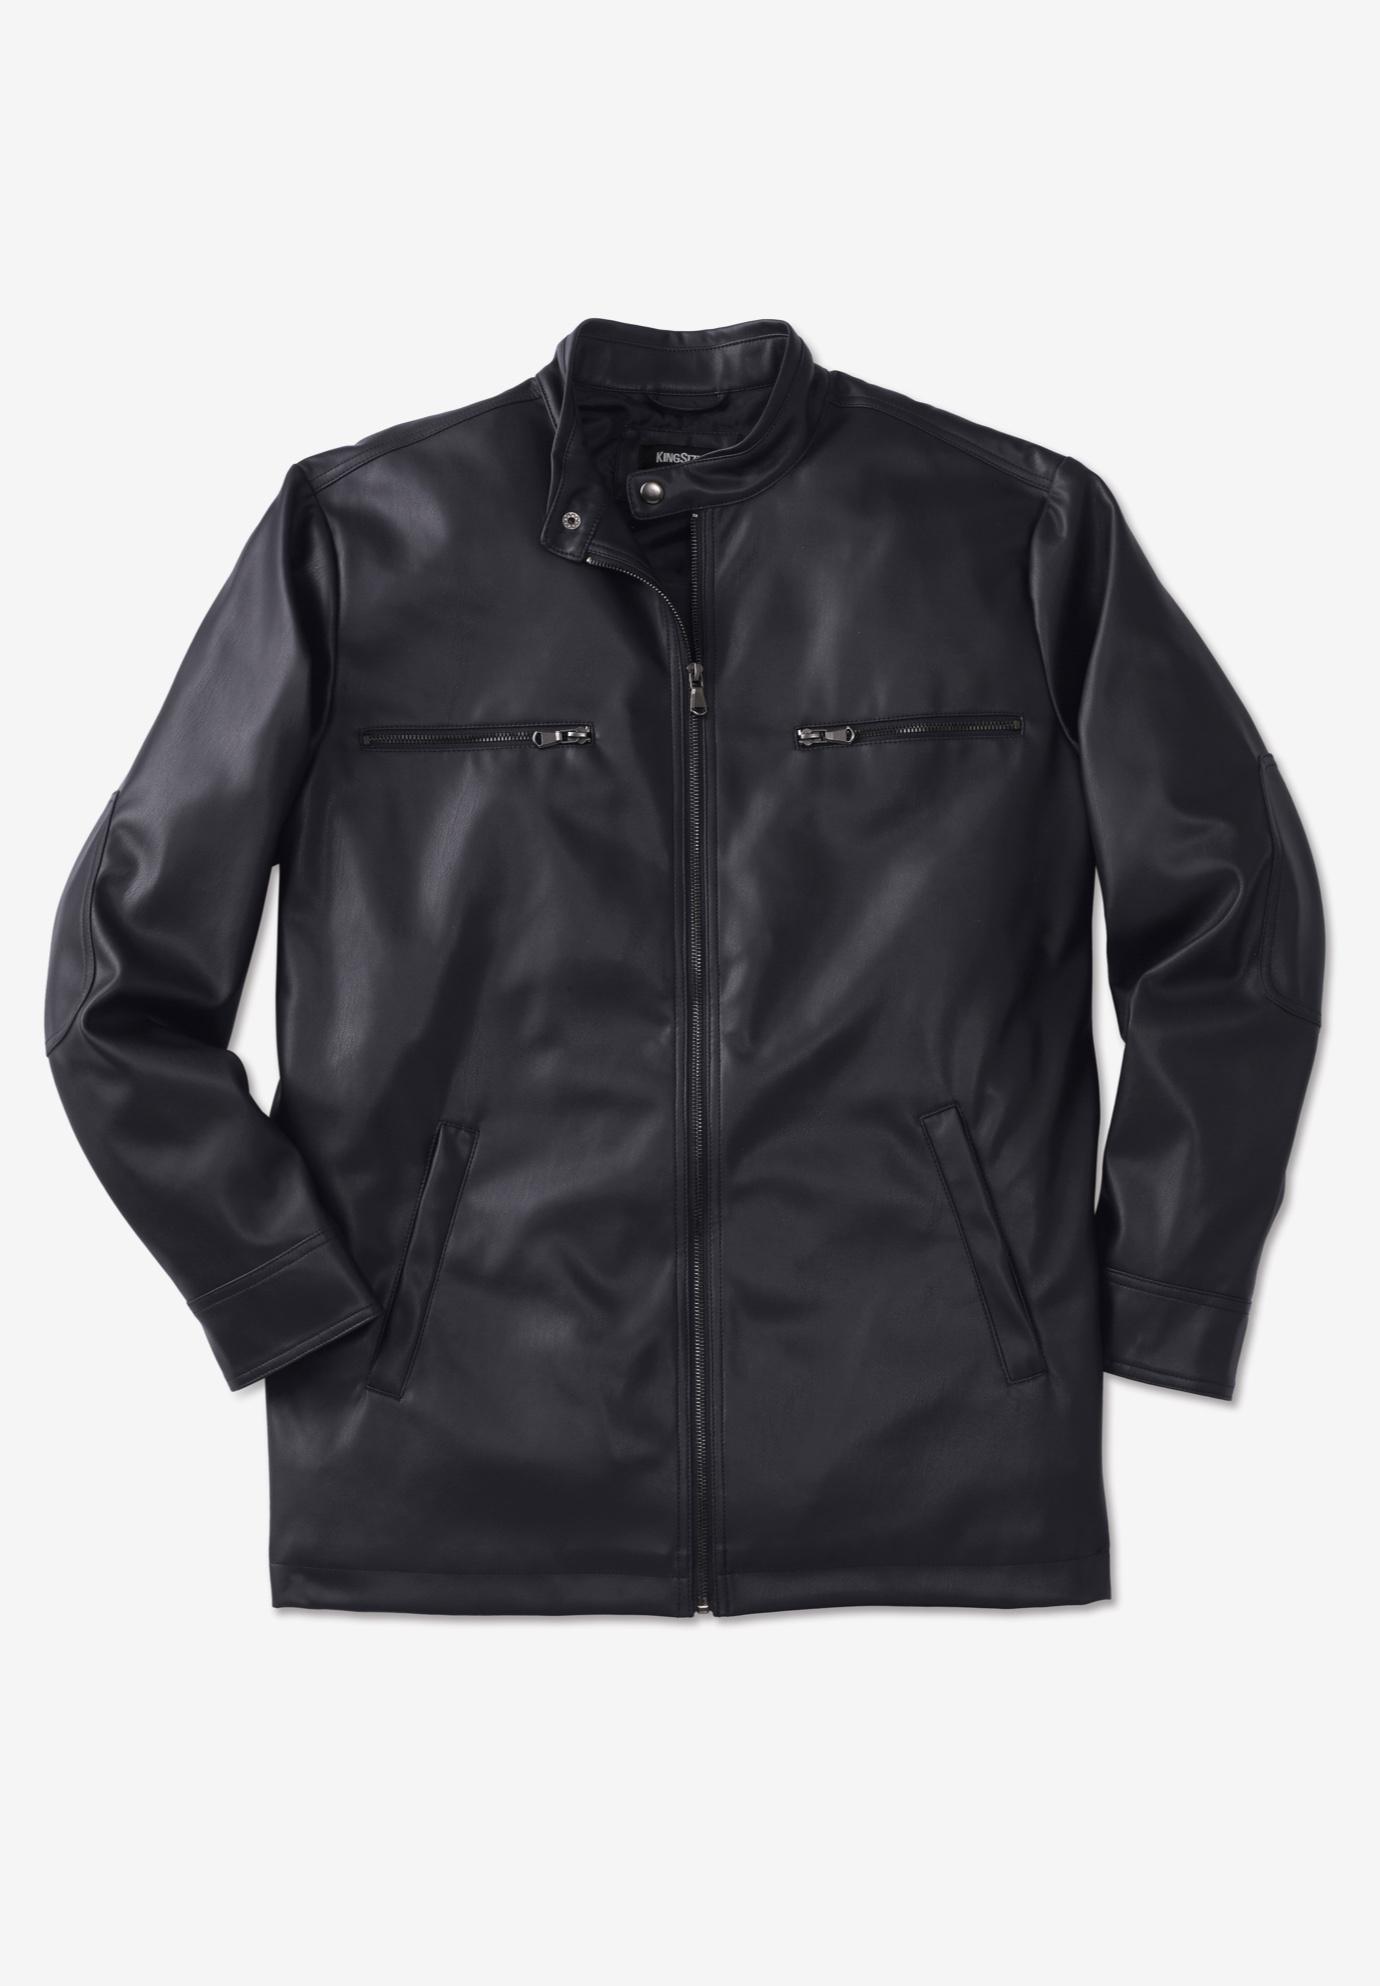 KingSize Mens Big /& Tall Faux Leather Moto Jacket